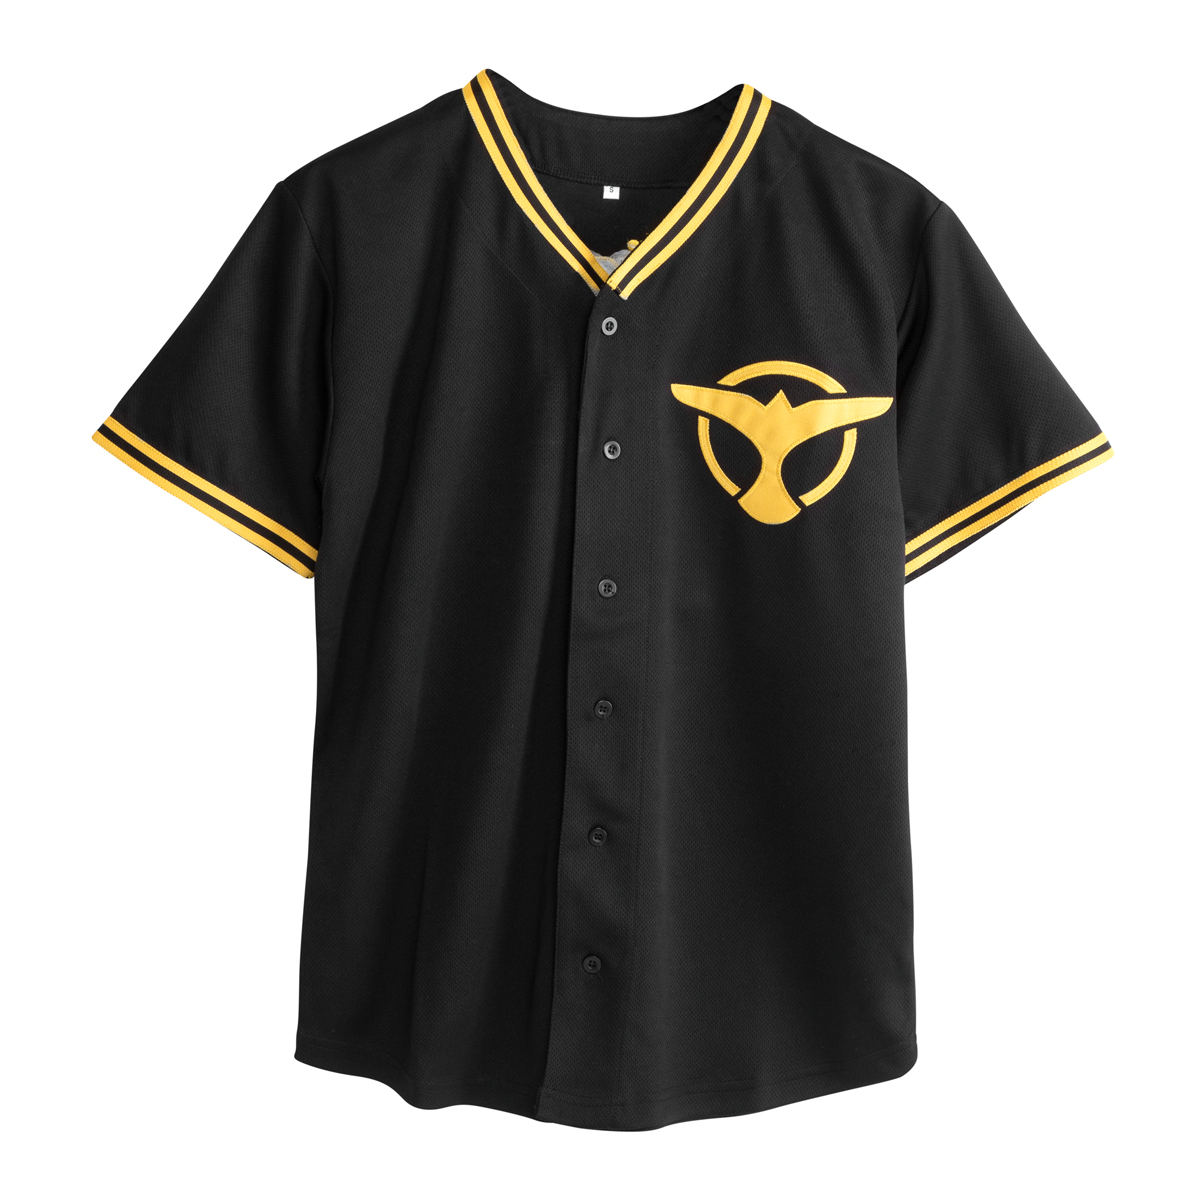 Spotify Exclusive Team Tiësto - Baseball Jersey